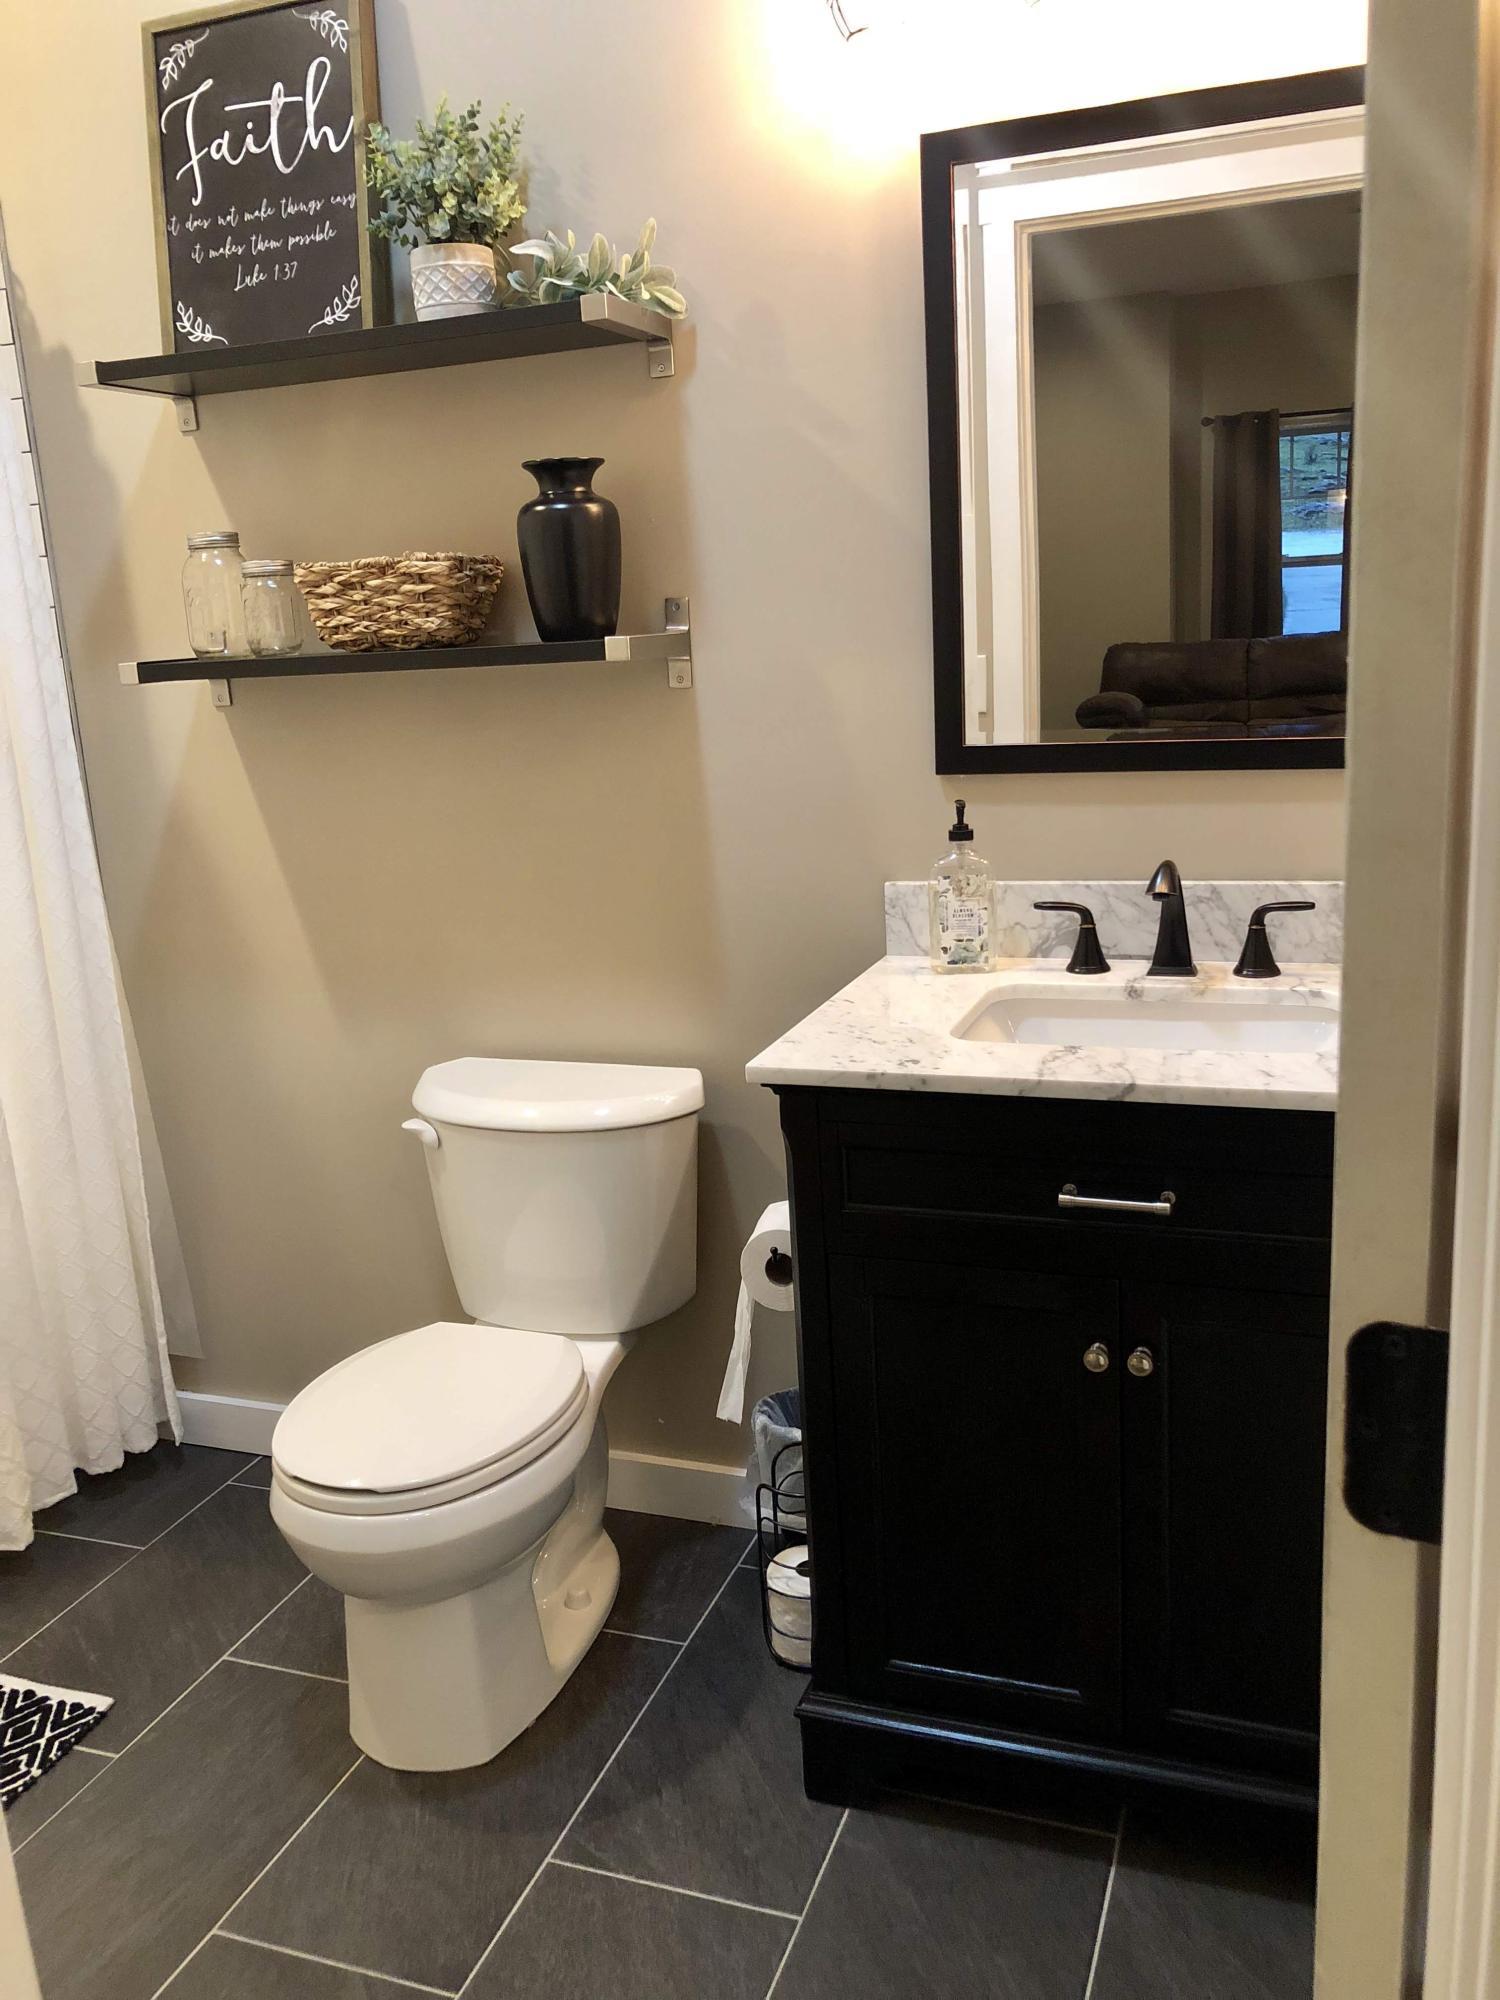 487 Glen, Maynardville, Tennessee, United States 37807, 3 Bedrooms Bedrooms, ,3 BathroomsBathrooms,Single Family,For Sale,Glen,1071653